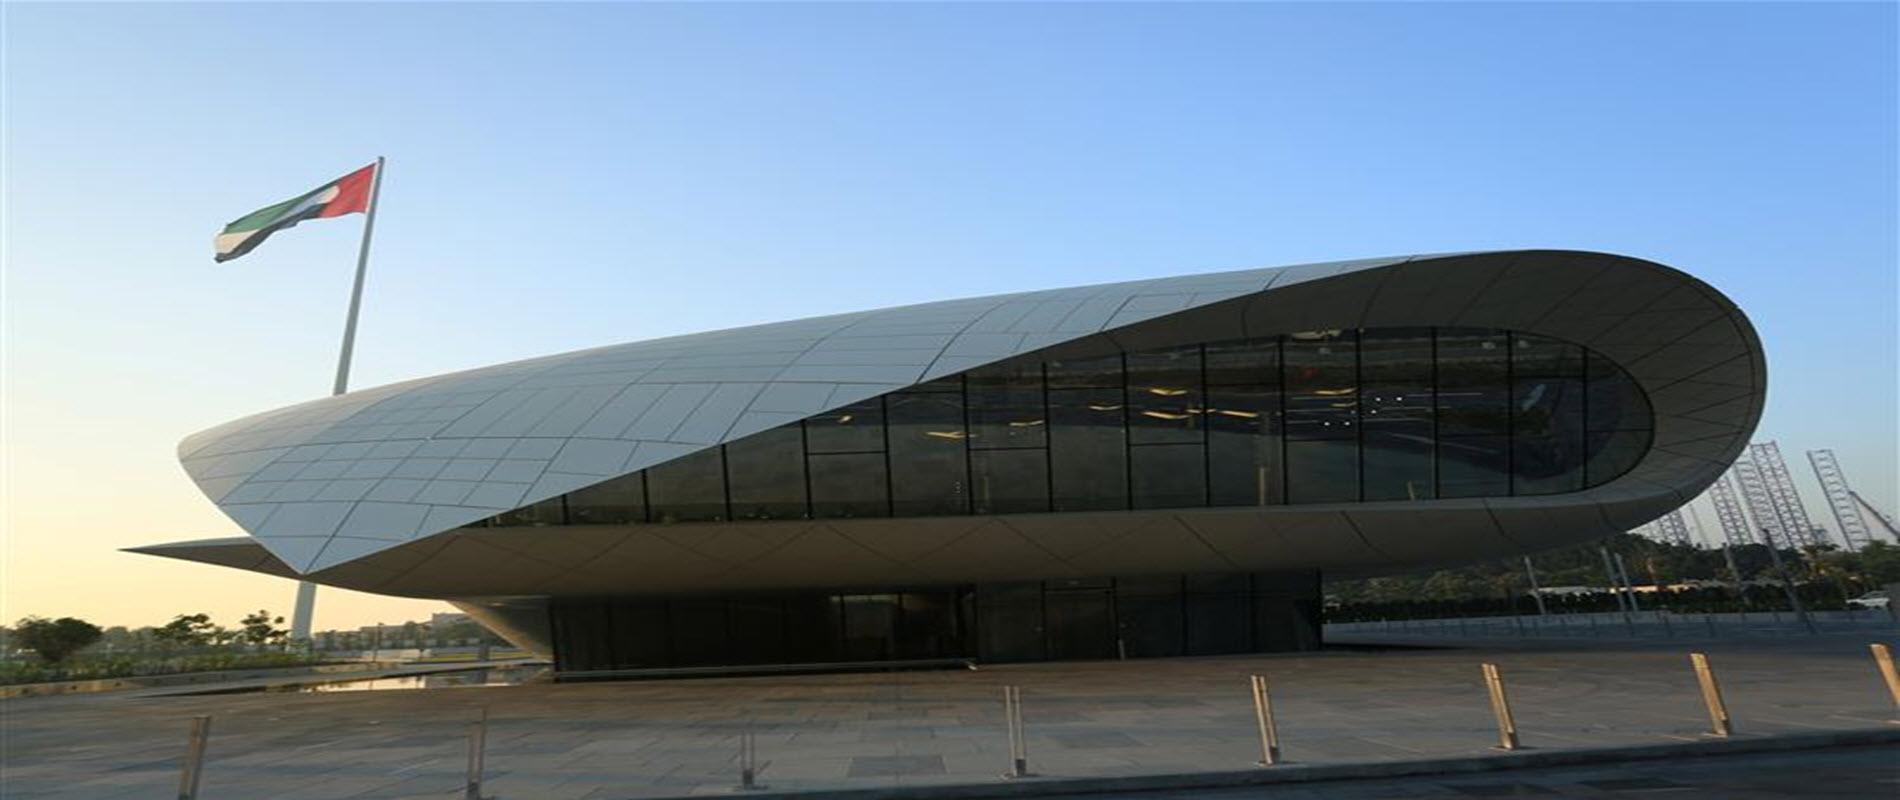 Combo Tours - Dubai City Tour and Etihad Museum